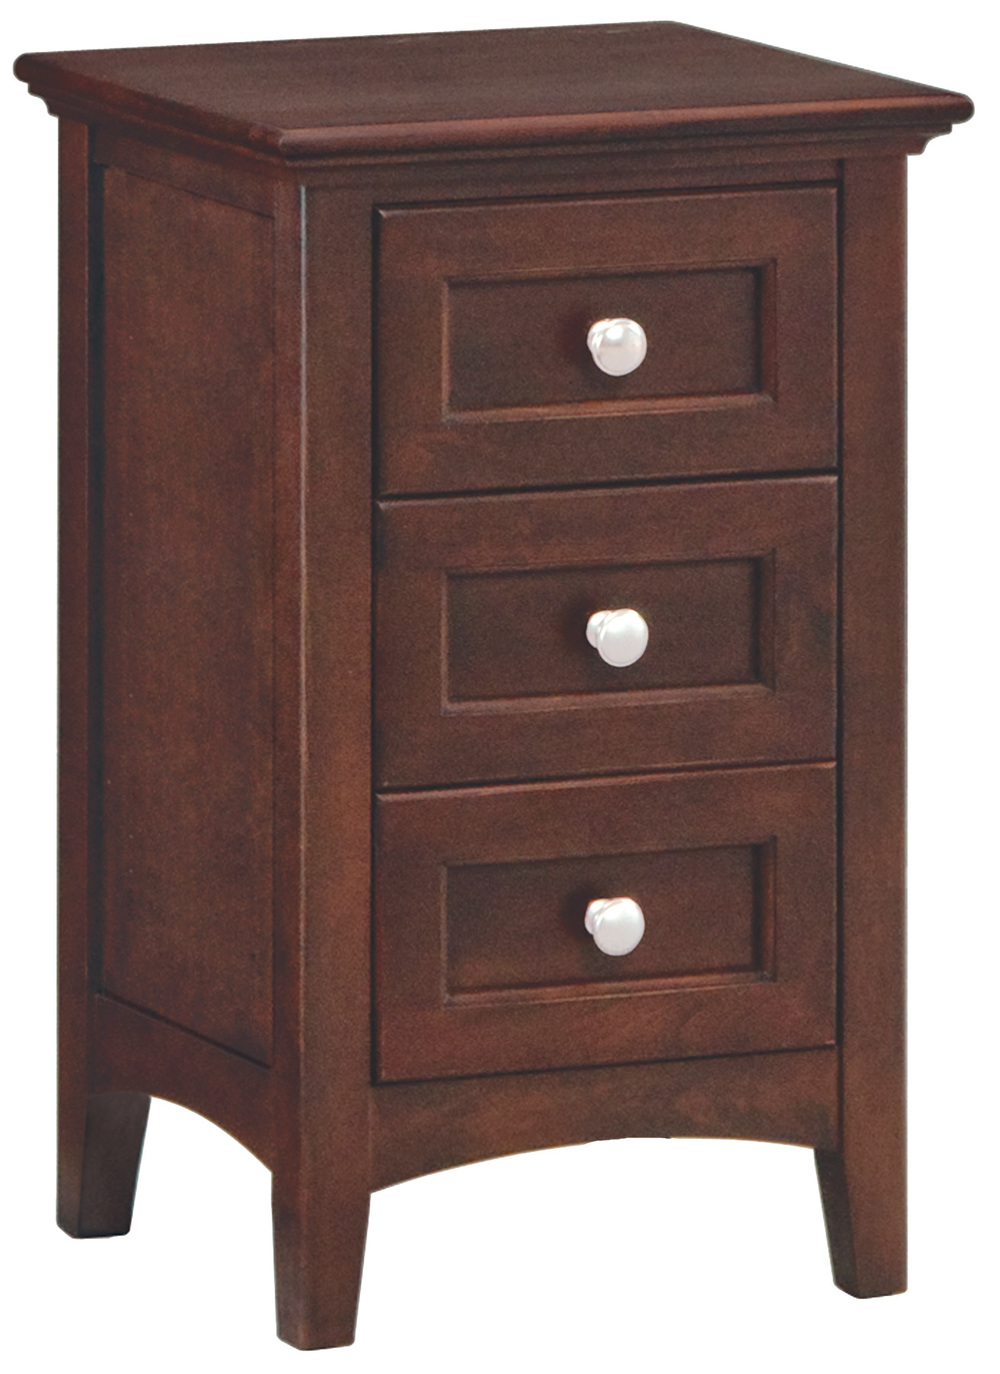 Whittier Wood Furniture - Small Three Drawer Nightstand